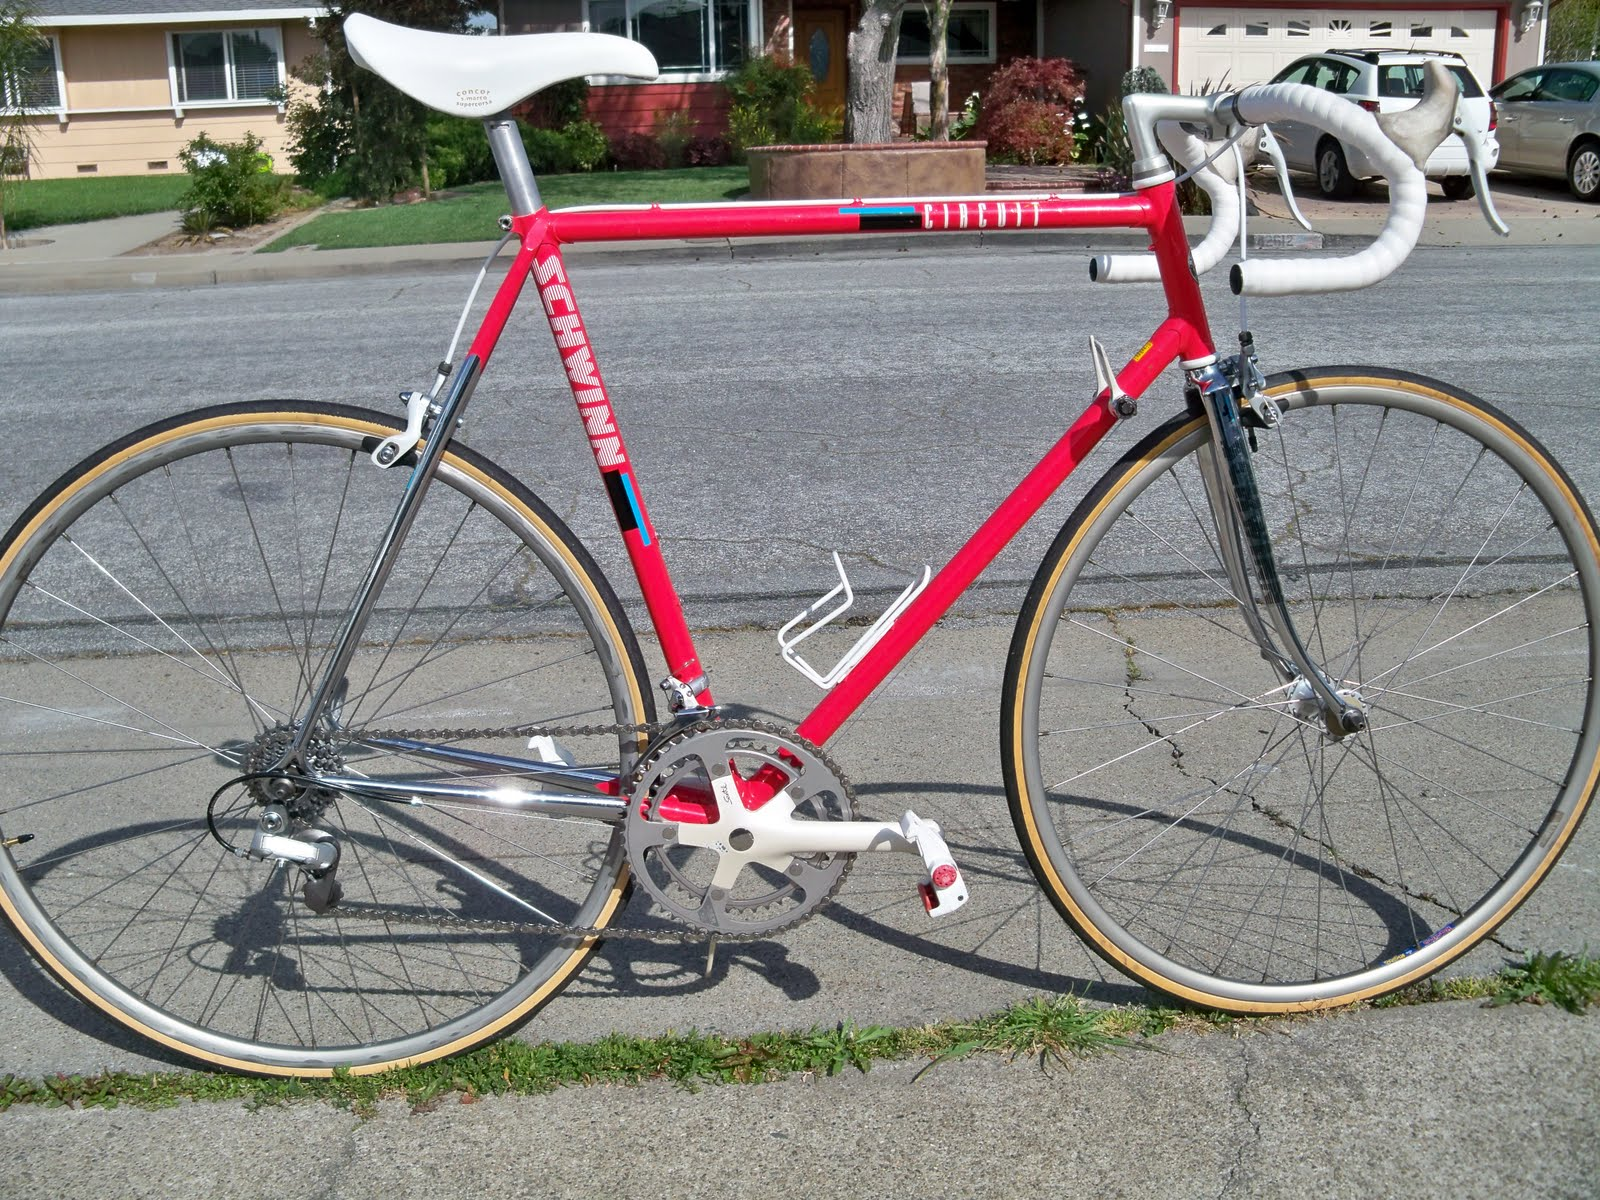 5522f327830 80's Vintage Parts and Restorations: Finally! 1988 Schwinn Circuit ...